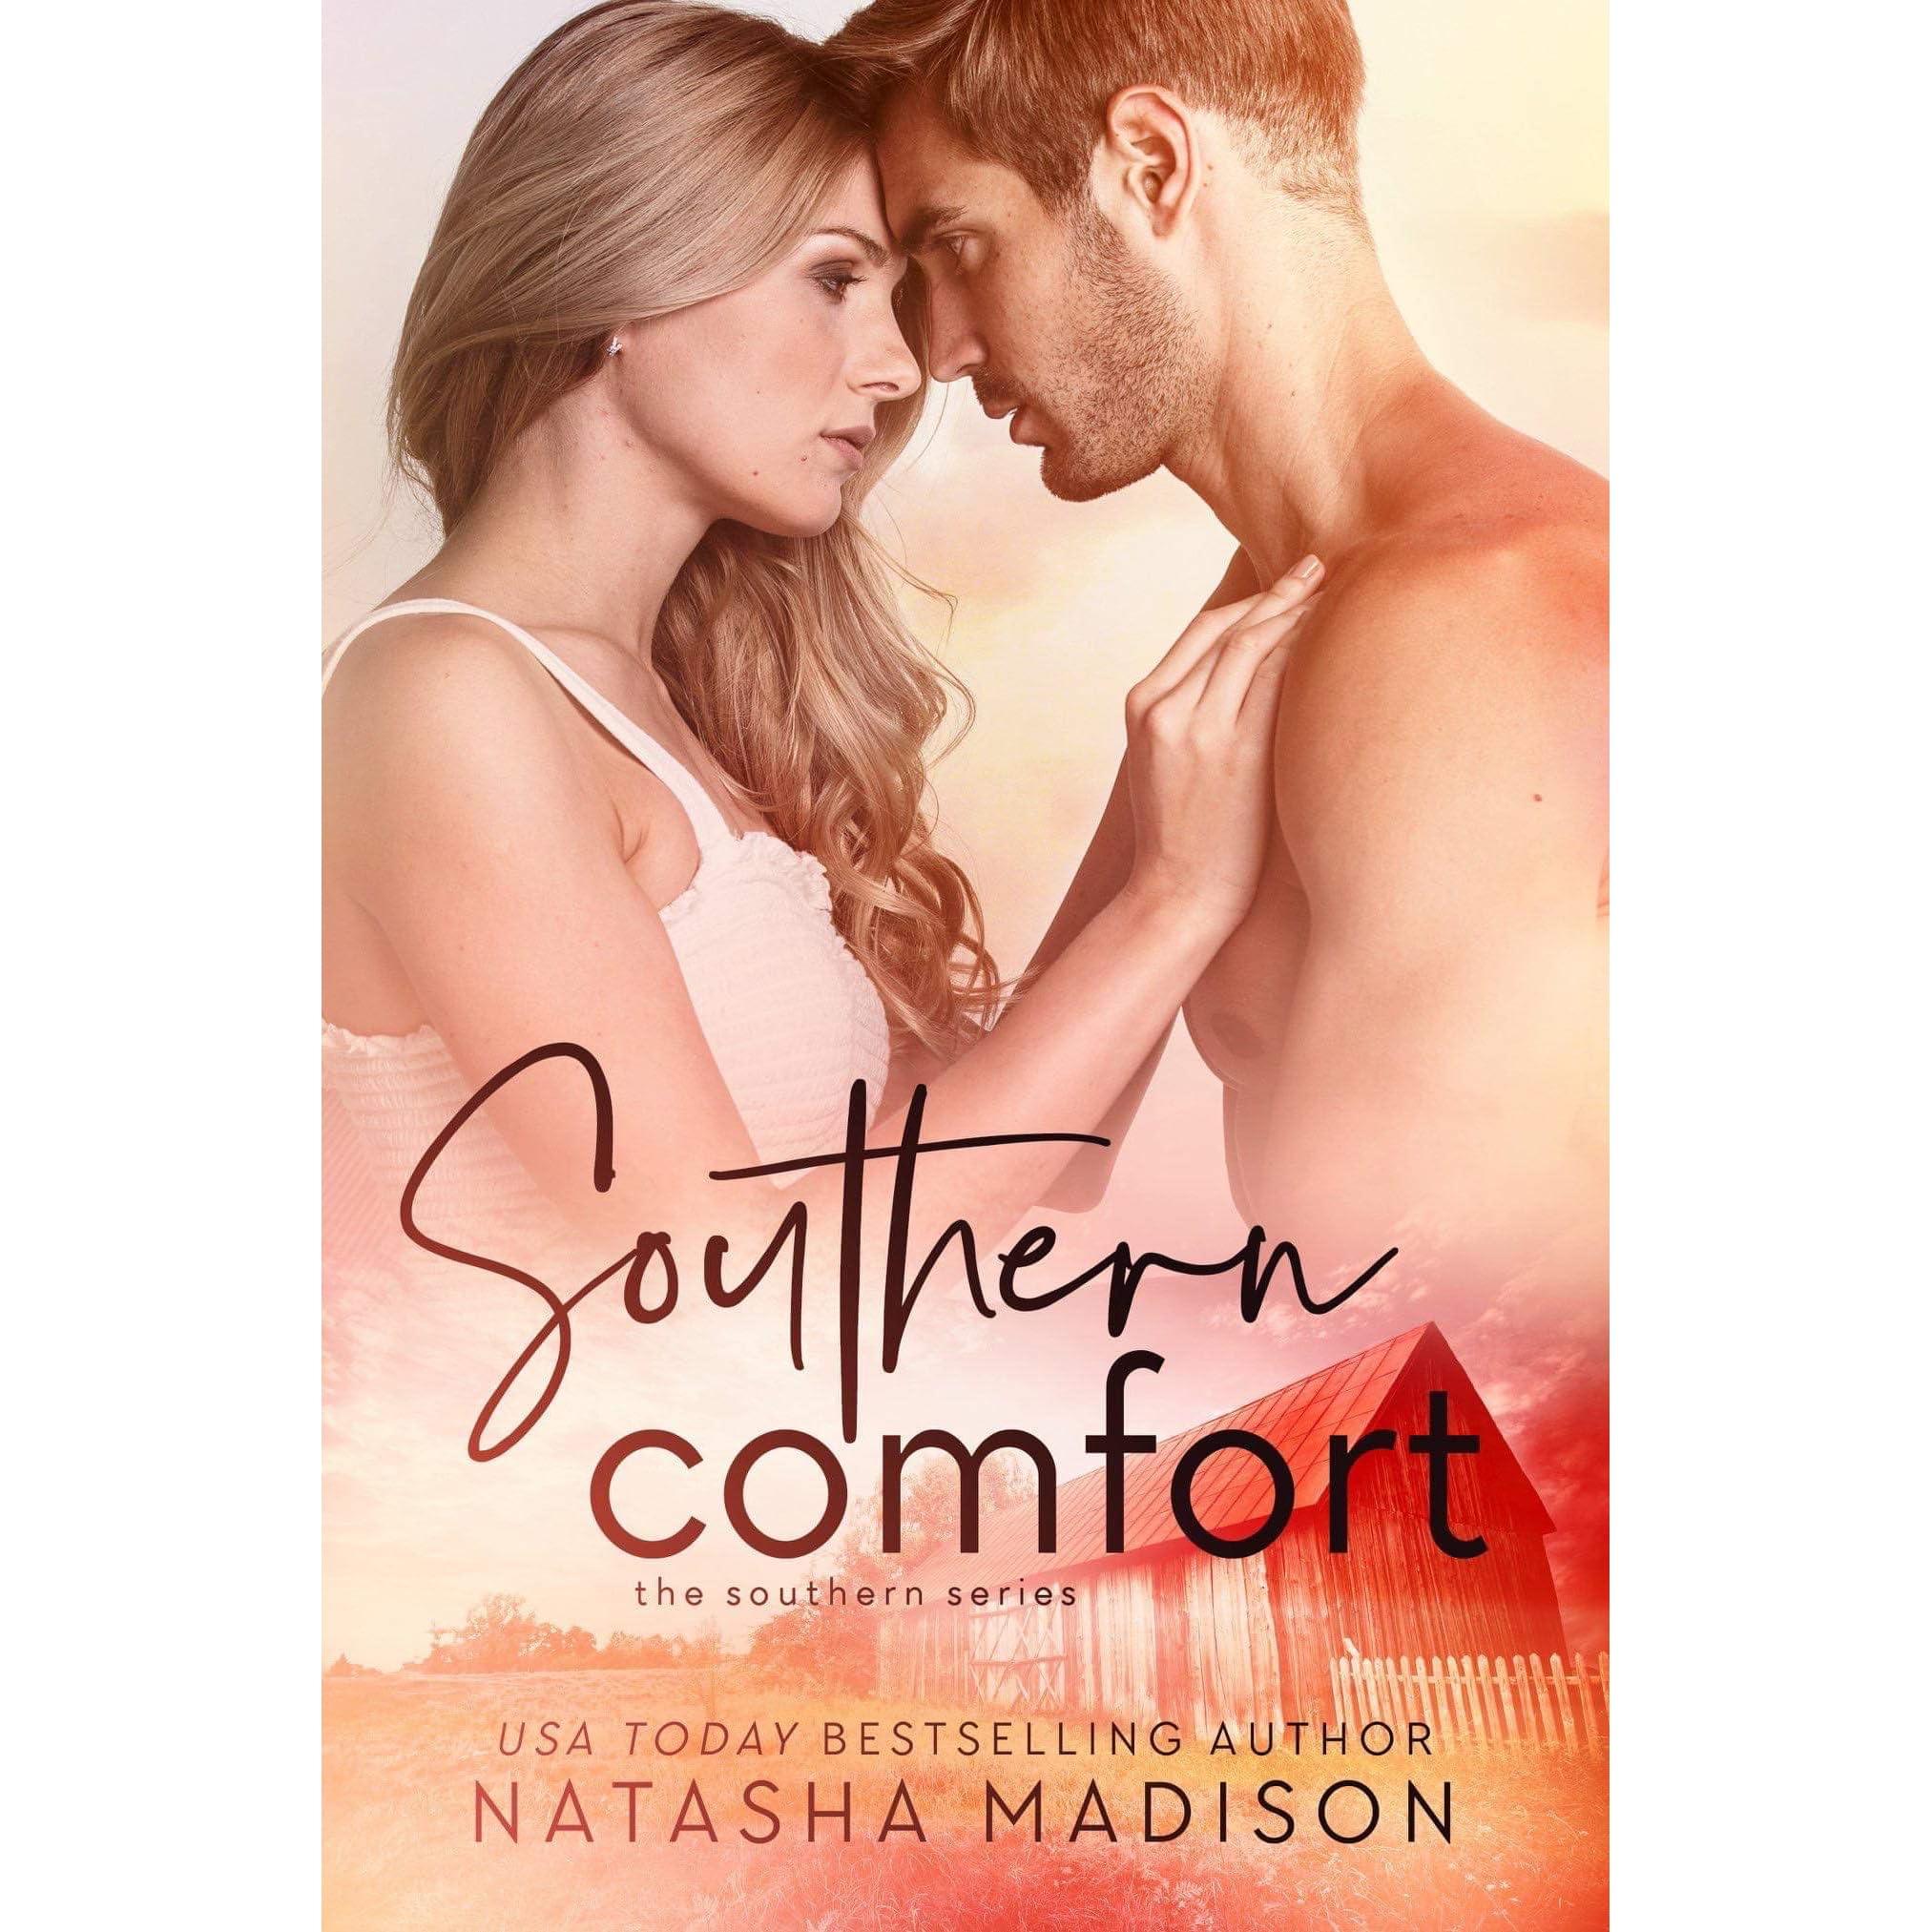 Southern Comfort (Southern Series, #2) by Natasha Madison